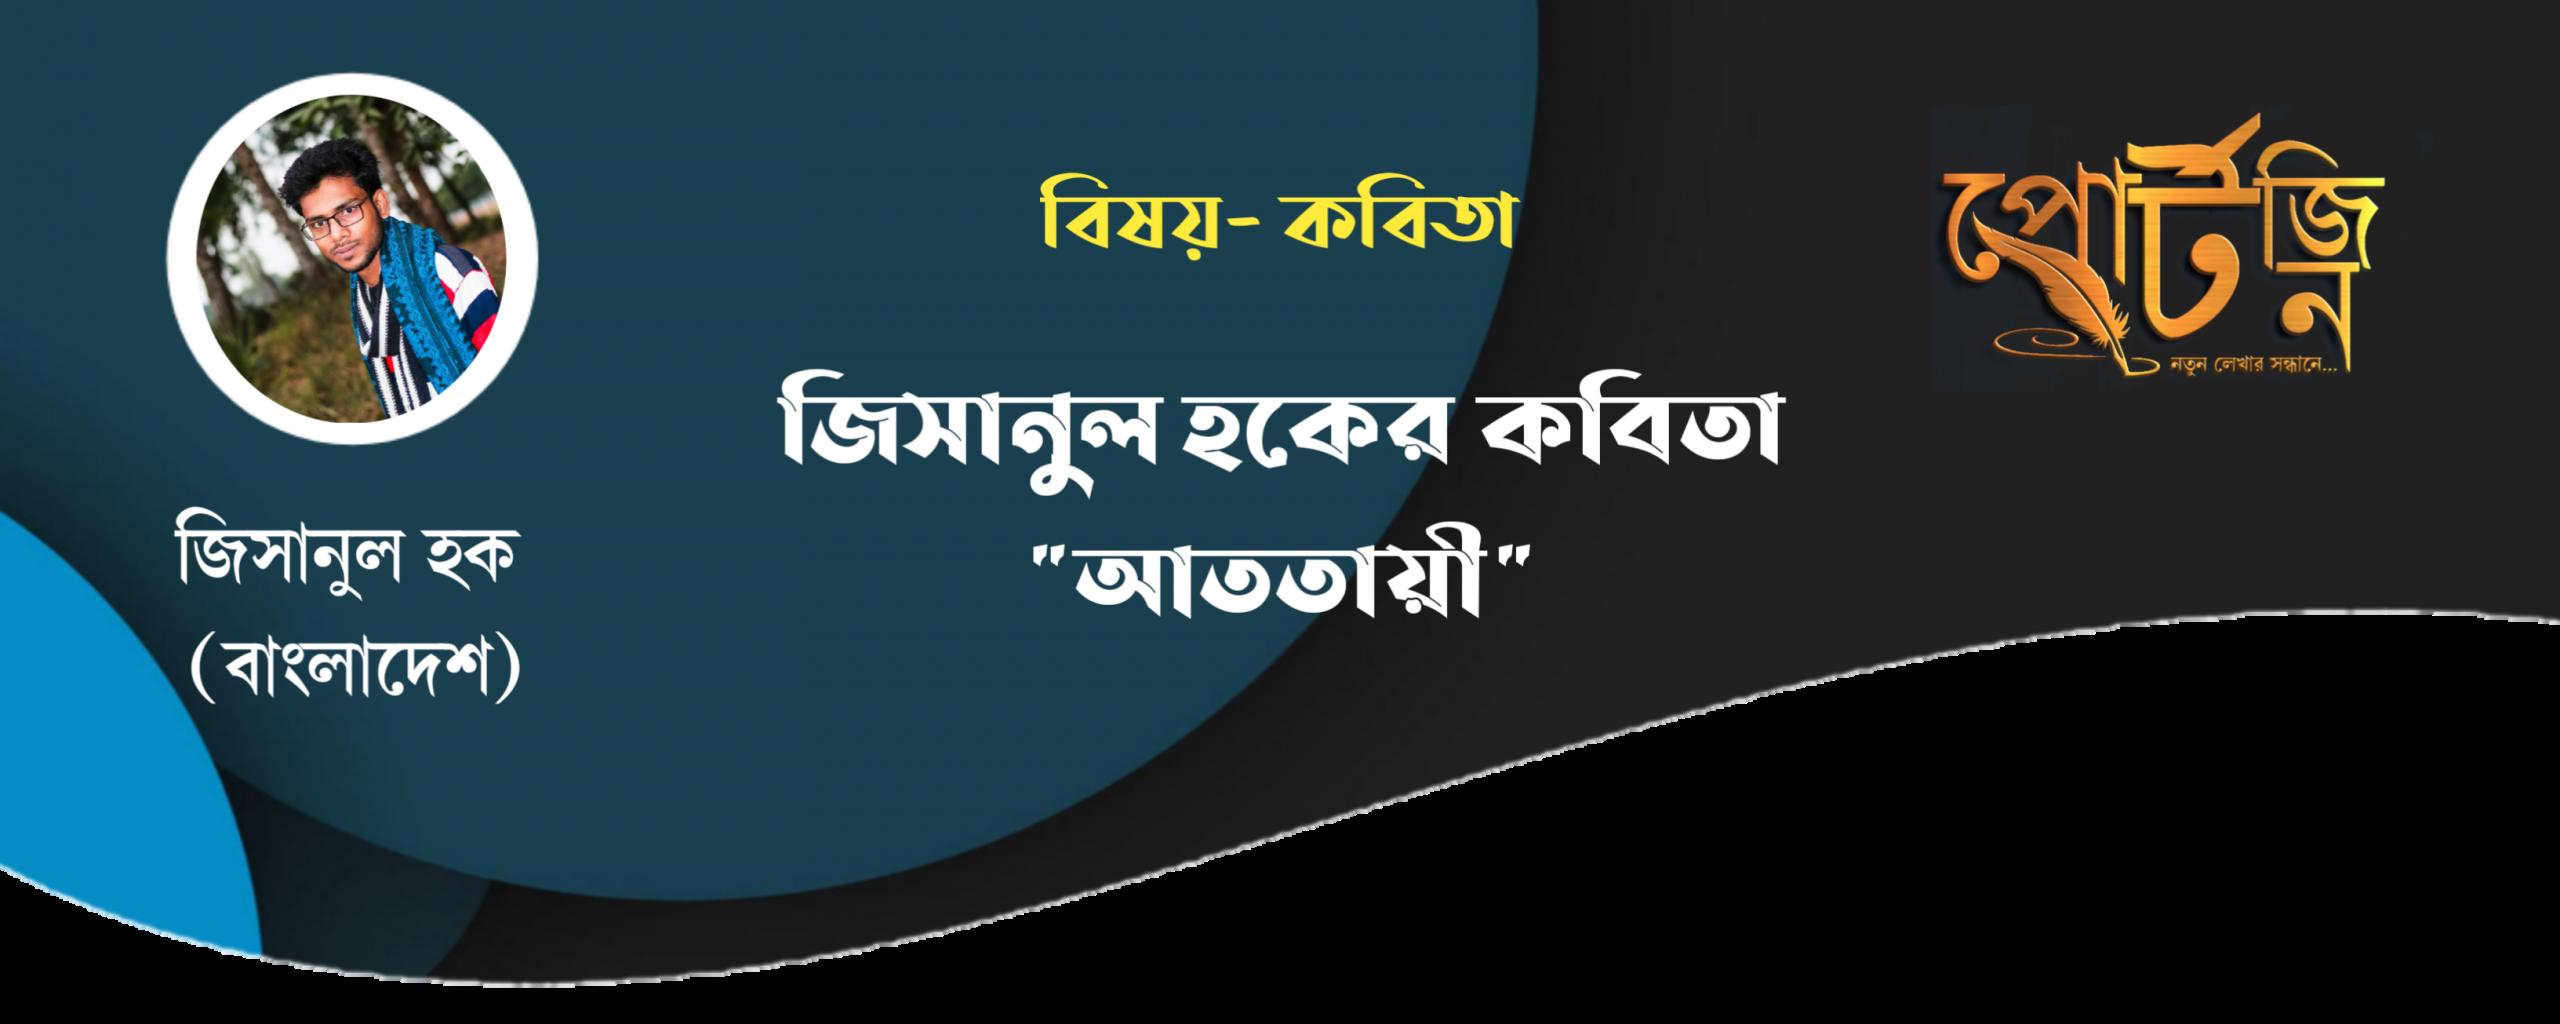 bangla live portzine jisanul haque